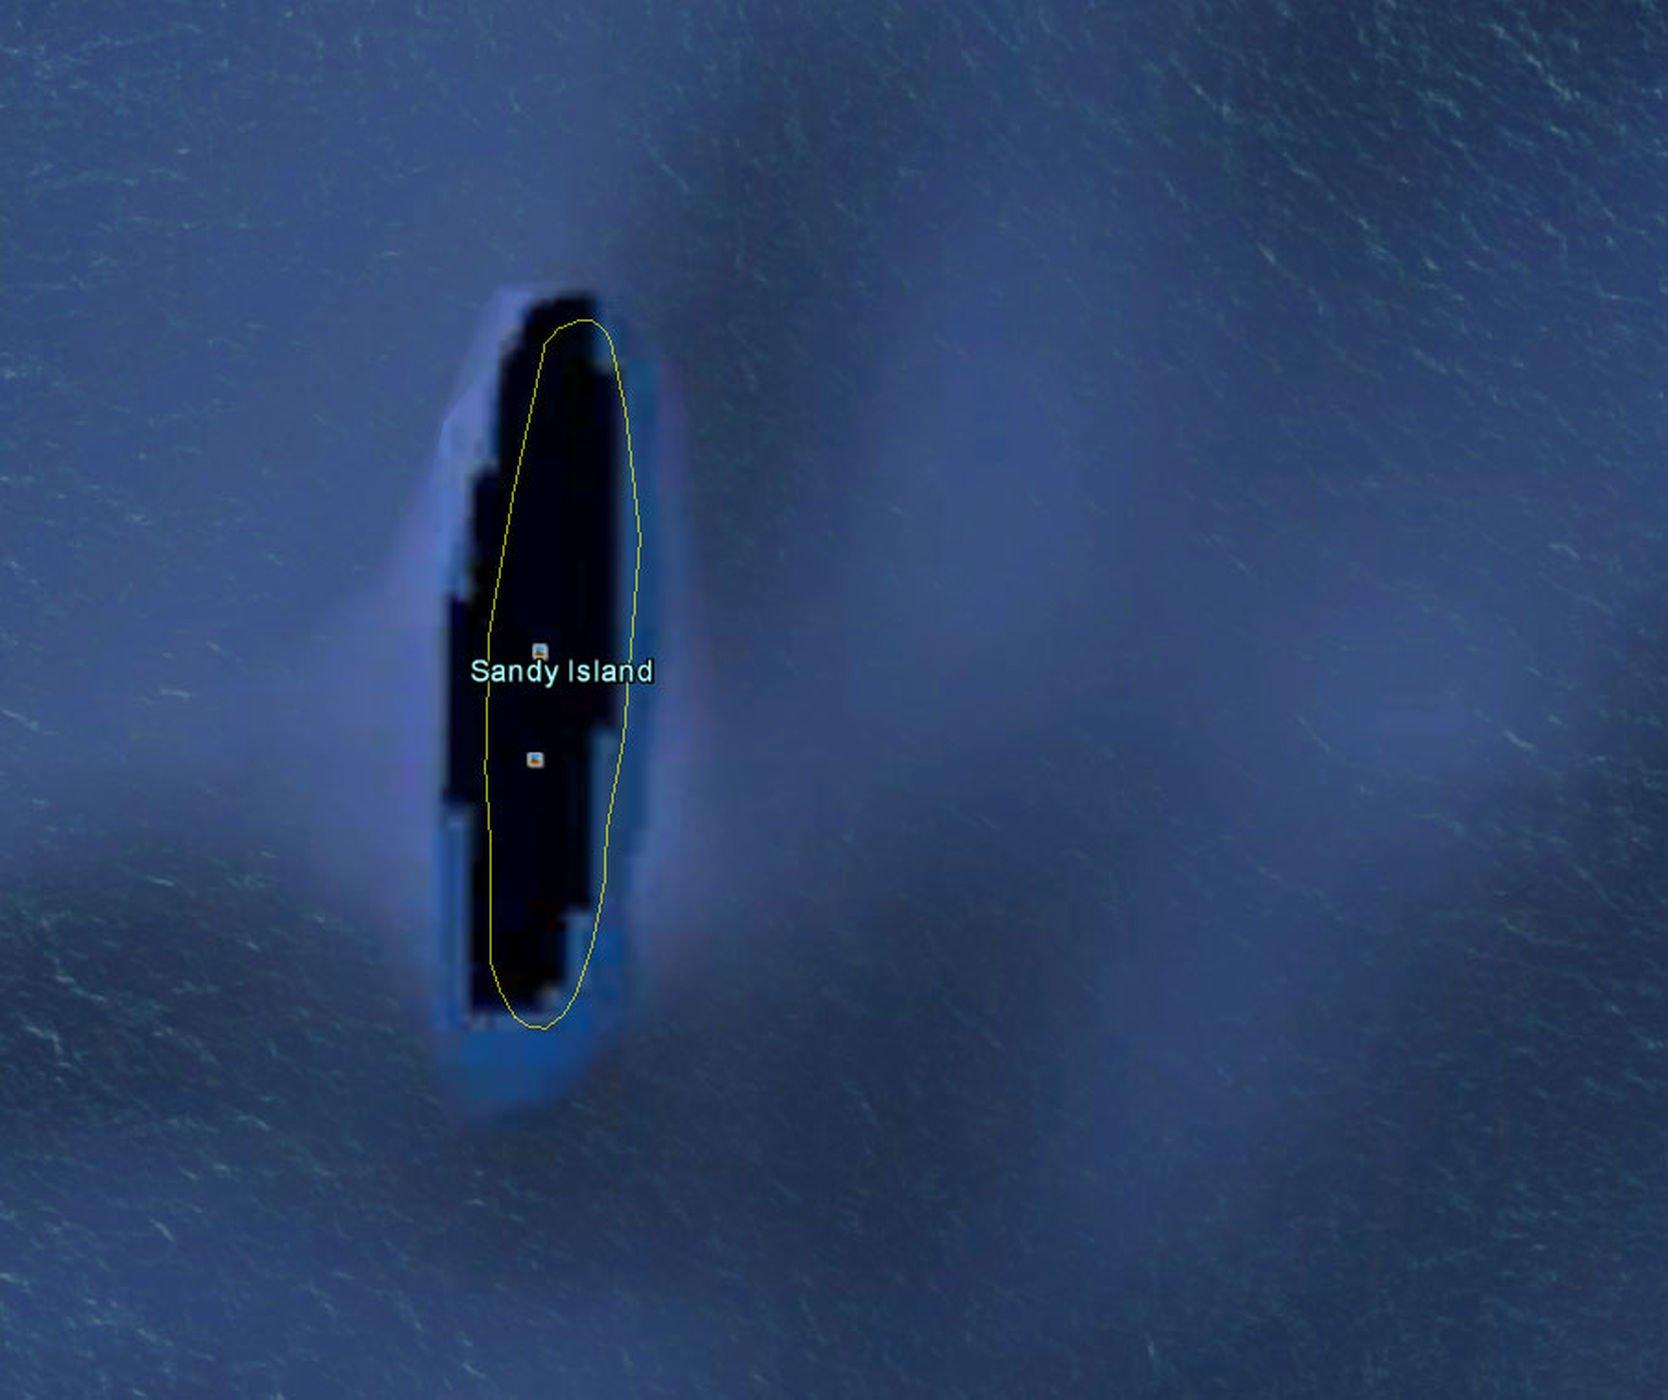 Google Earth - insula-sandy